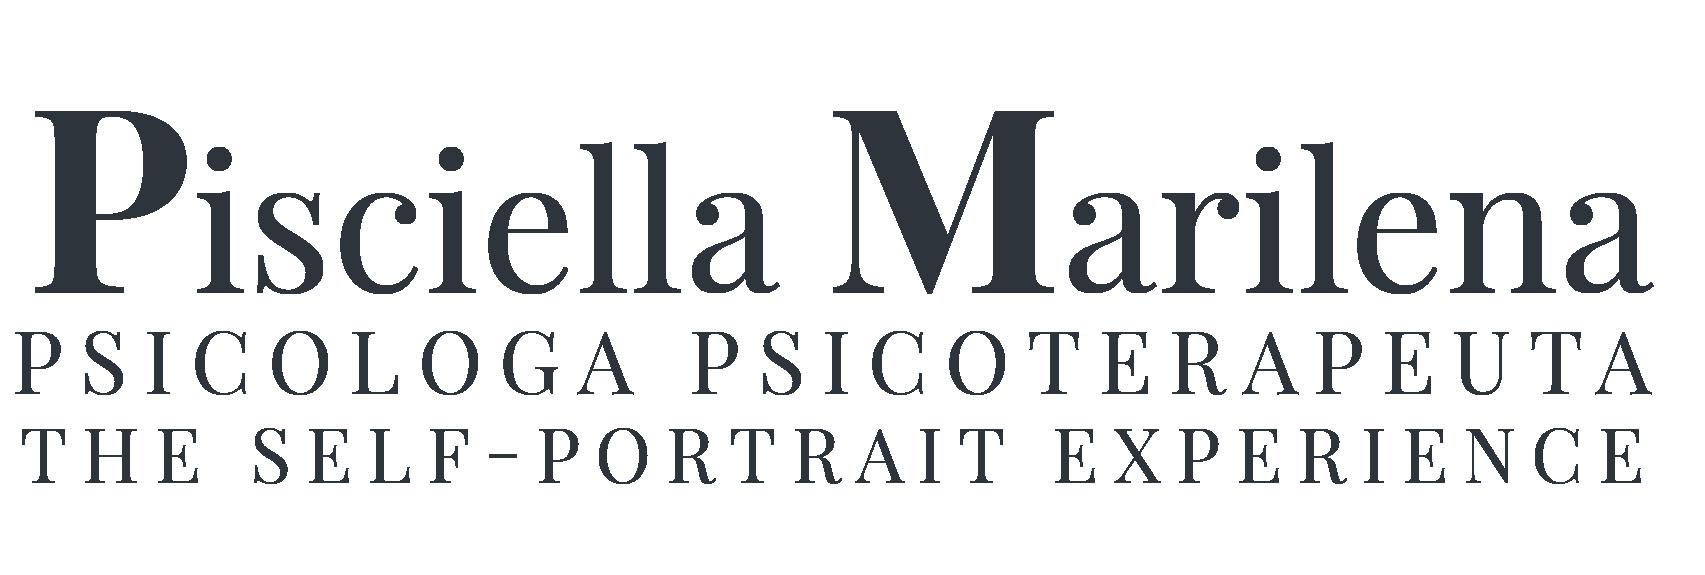 Dott.ssa Marilena Pisciella - Psicologo Psicoterapeuta